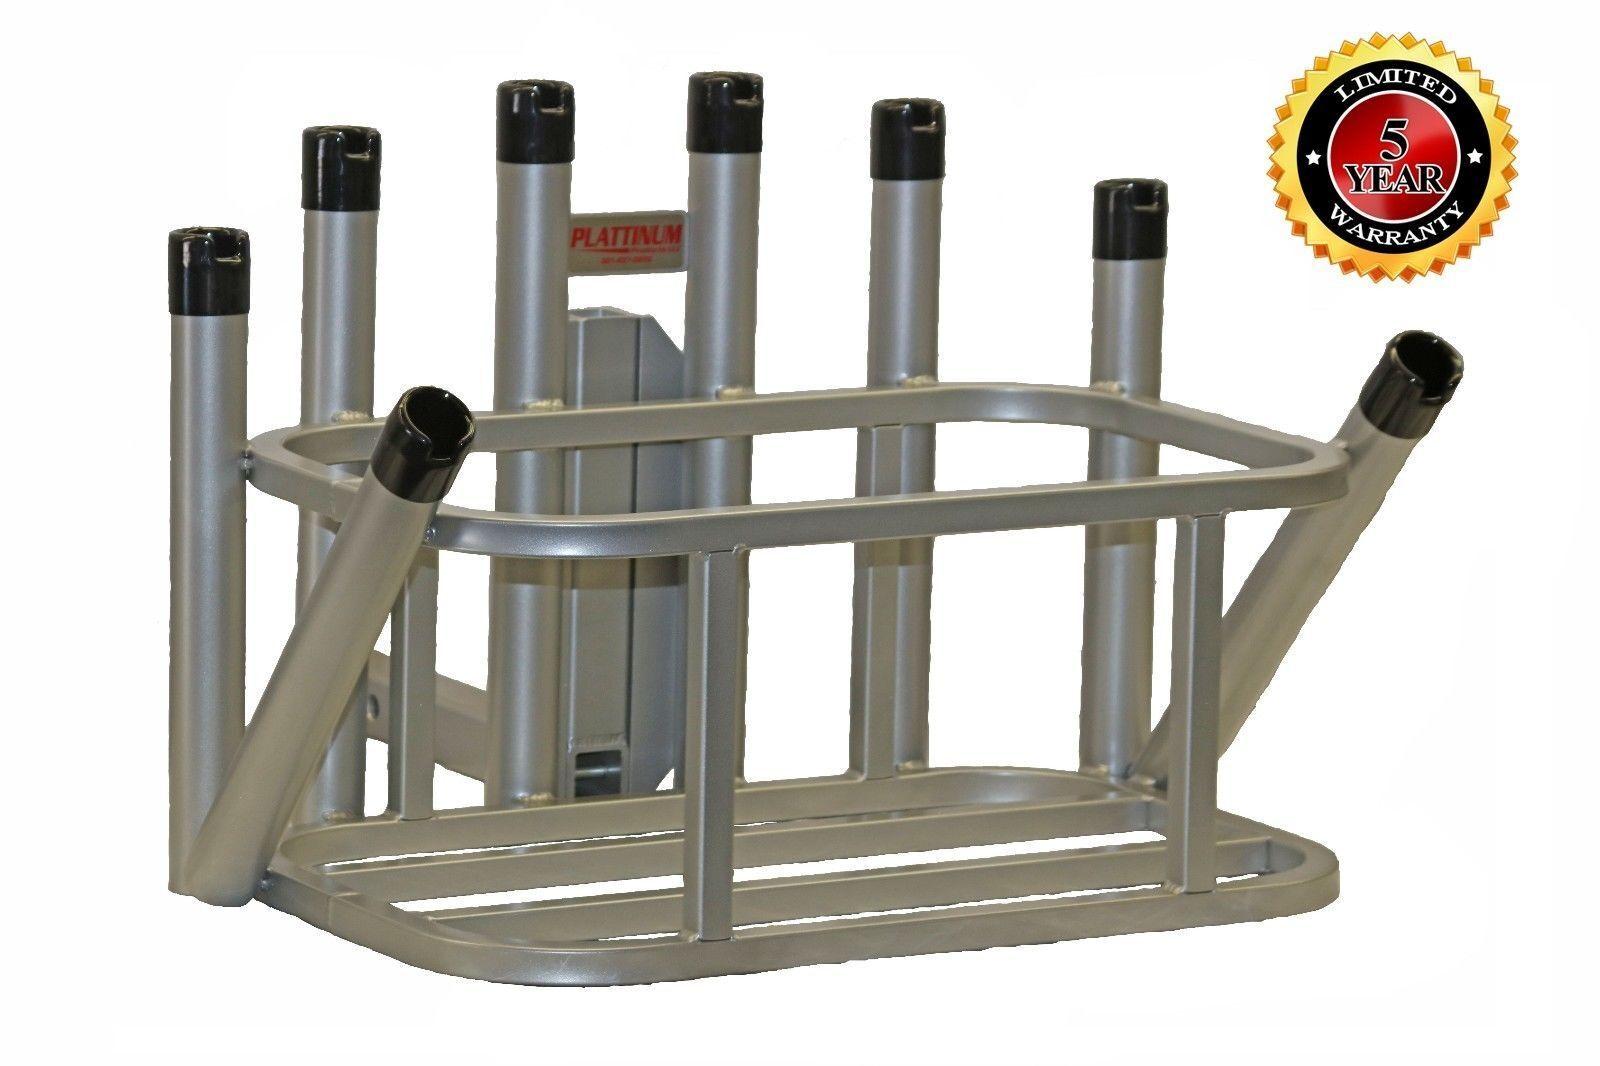 Plattinum, Fishing Rod Holder Cooler Holder  48-54 Qt w Notched Rod Caps  up to 60% discount